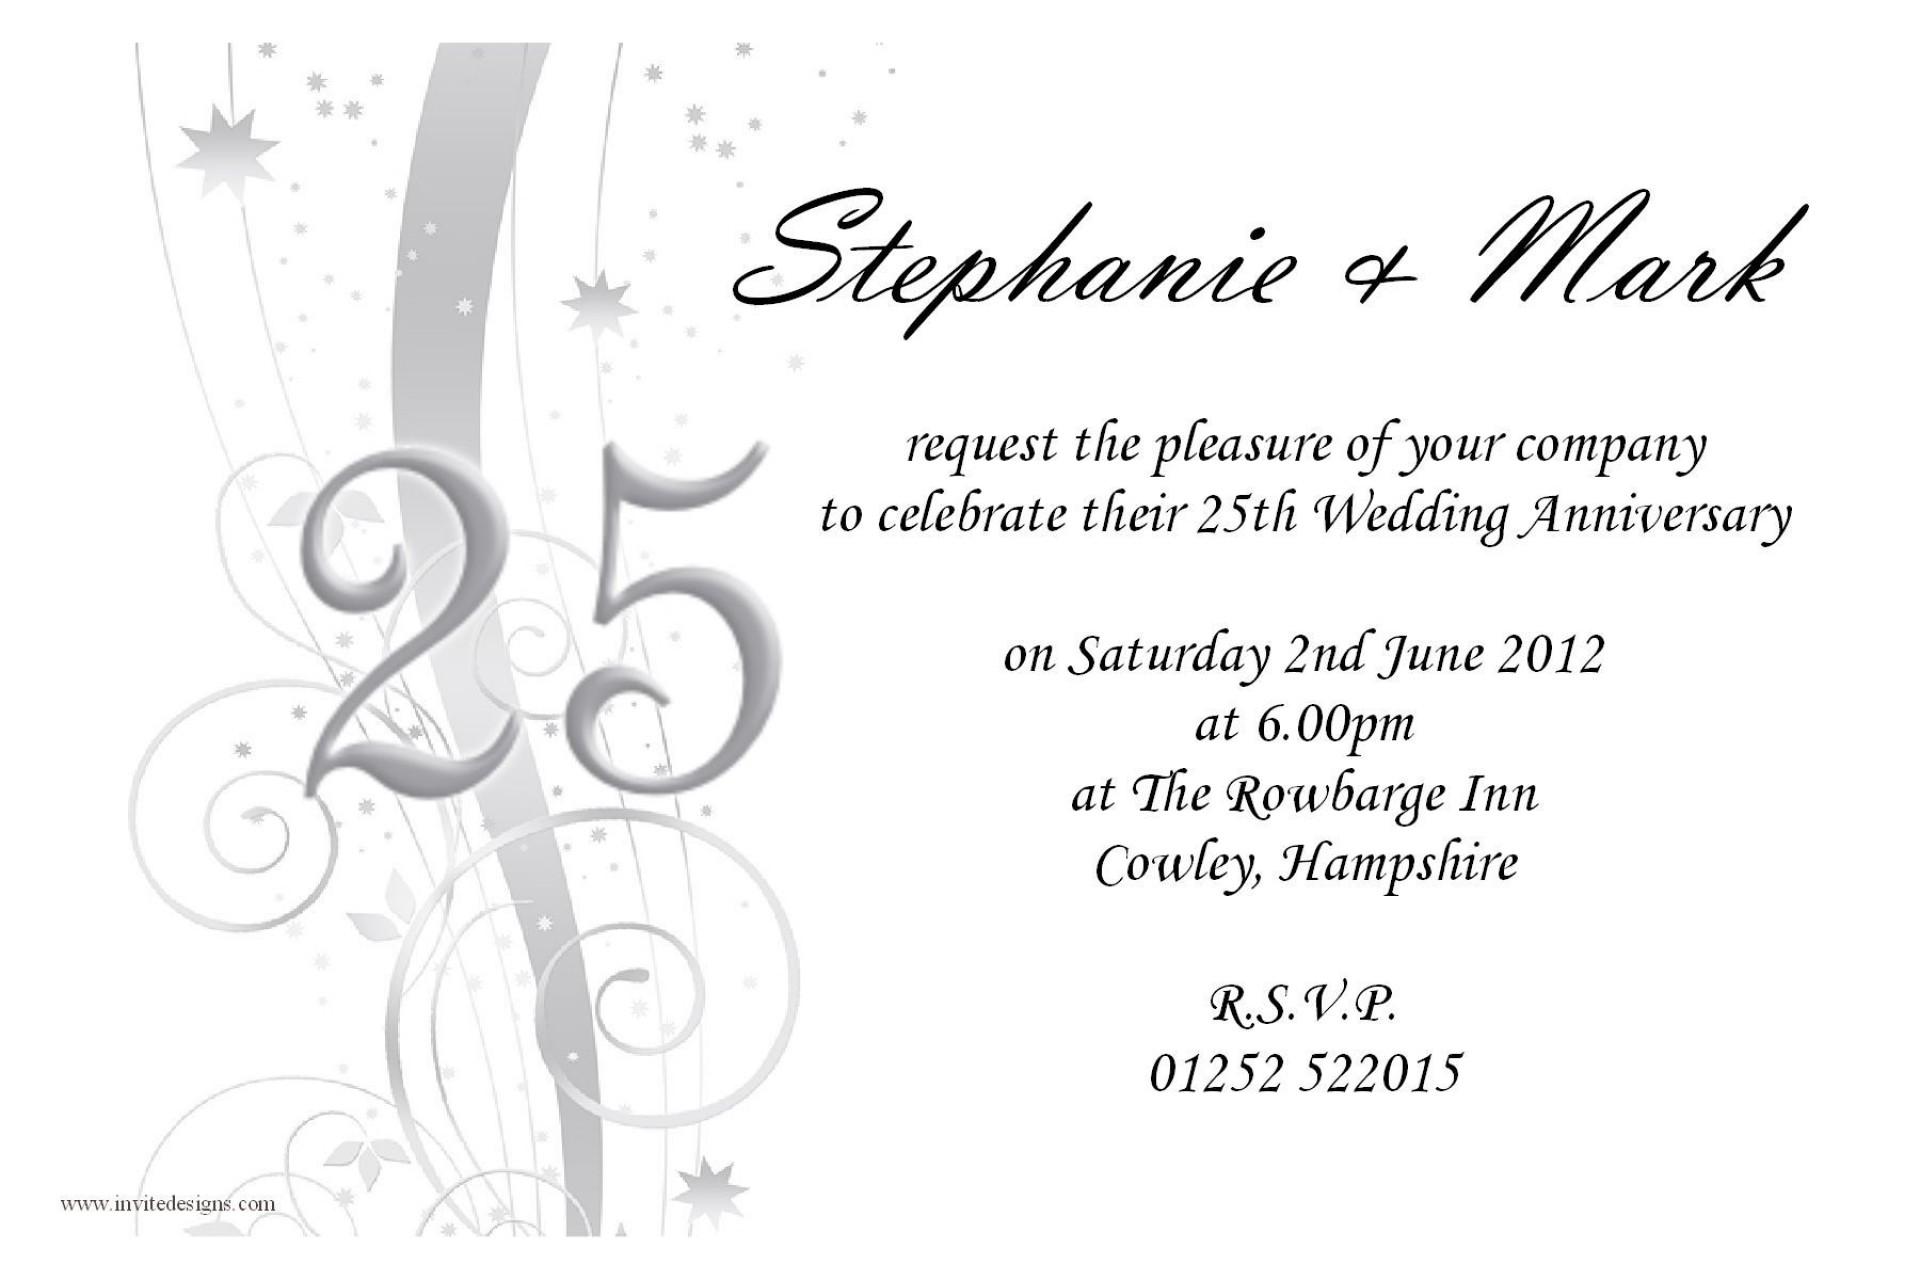 002 Incredible 50th Anniversary Invitation Wording Sample High Definition  Samples Wedding Card1920